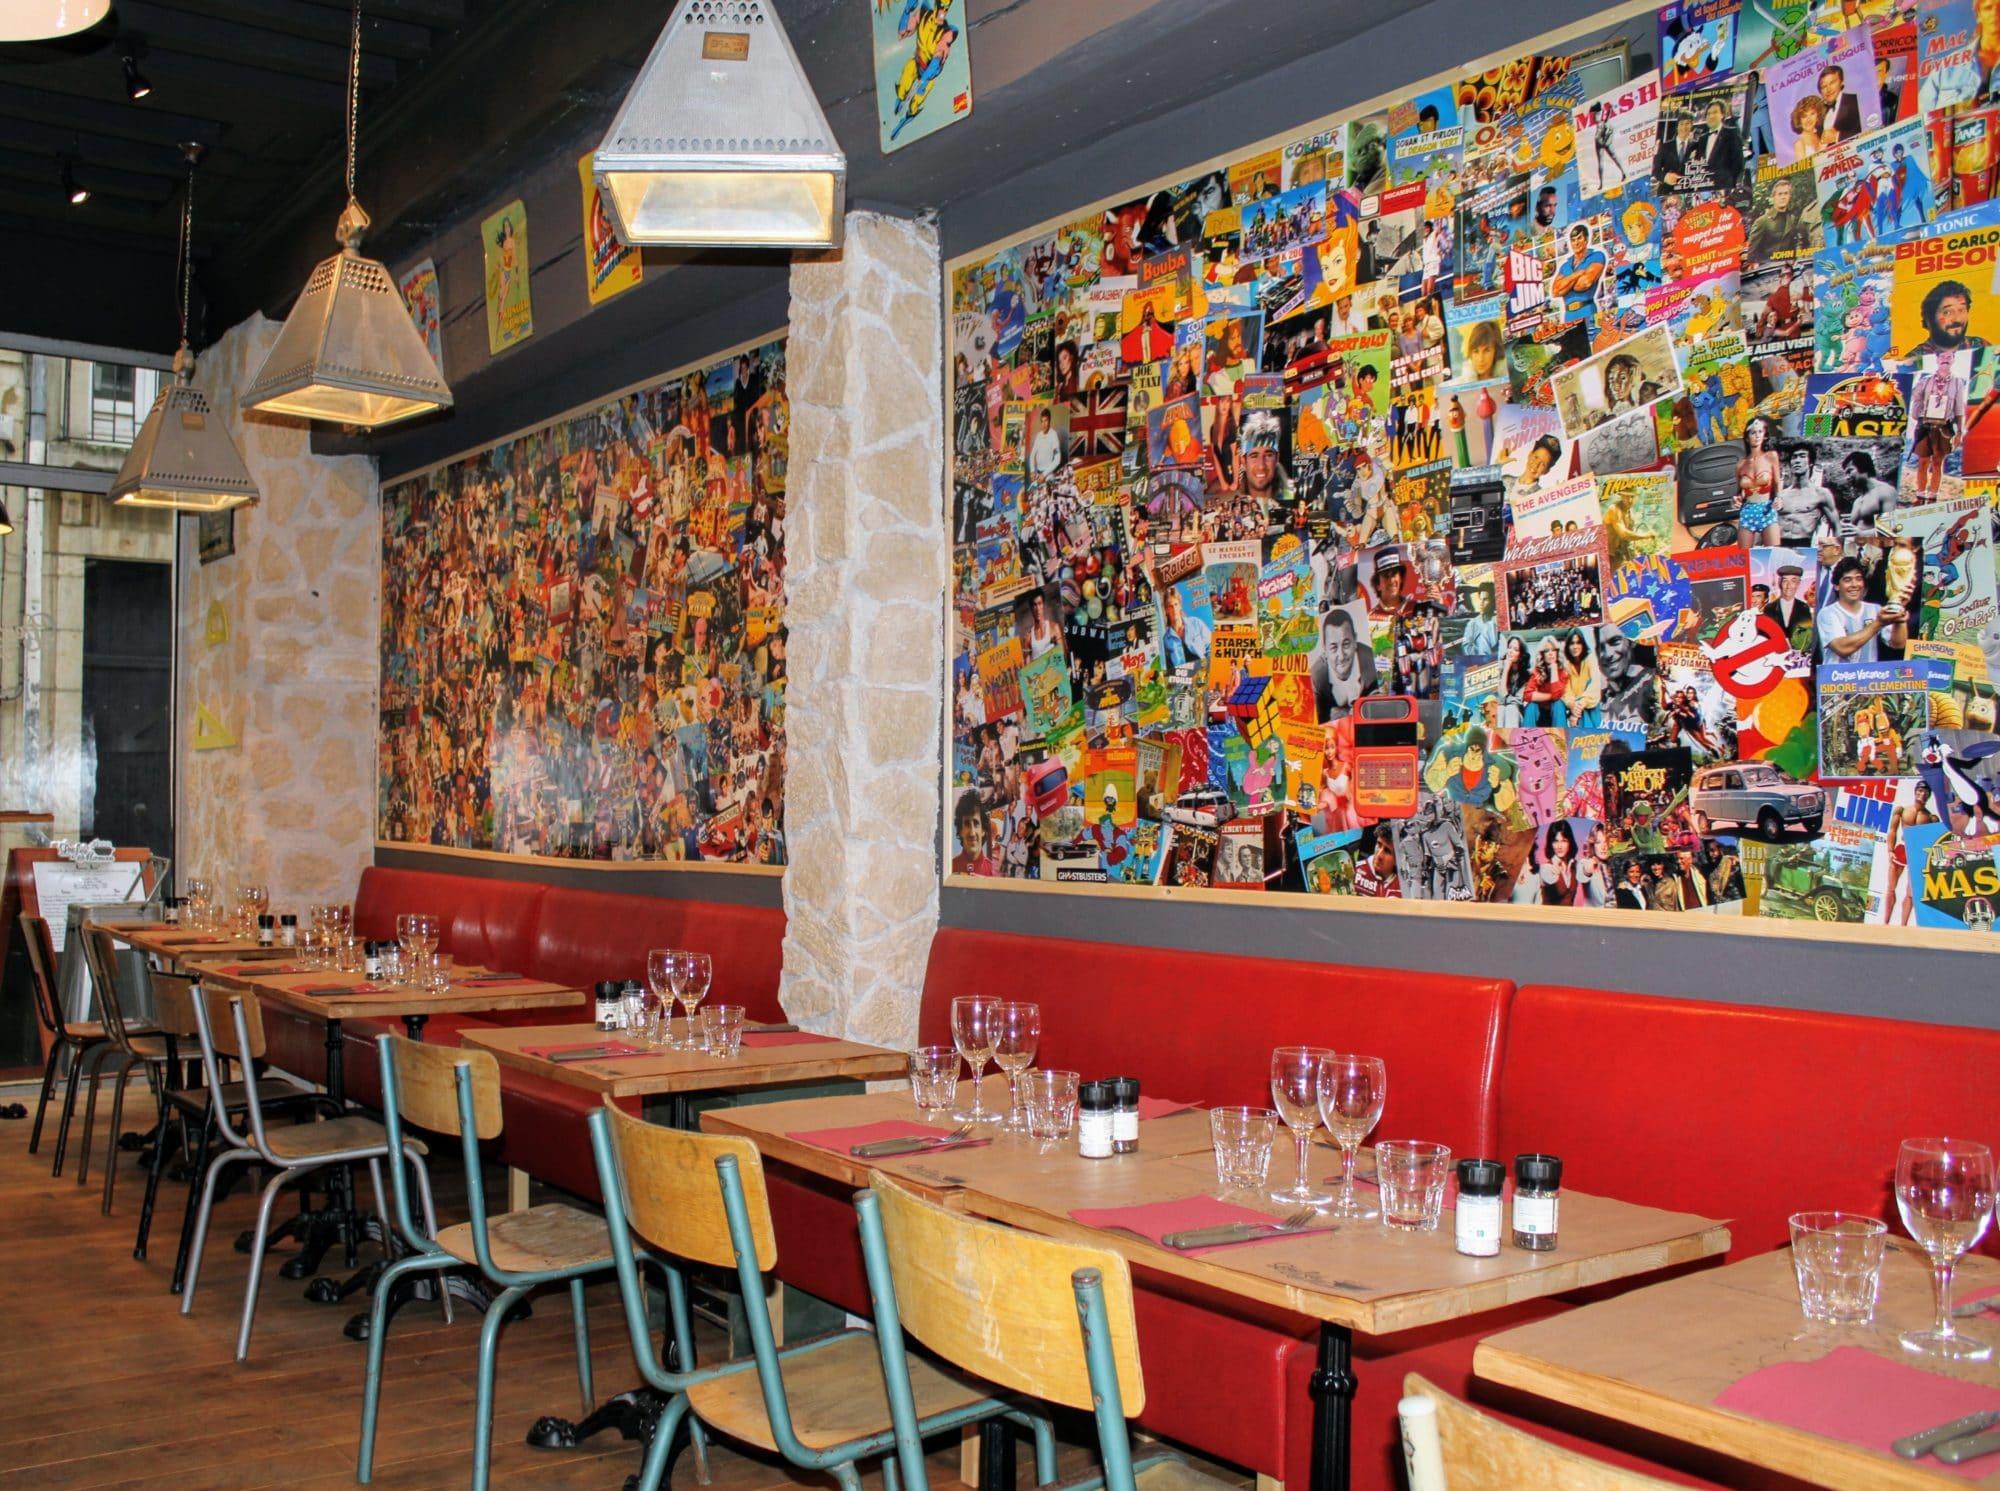 Salle ou terrasse de restaurant à Dijon